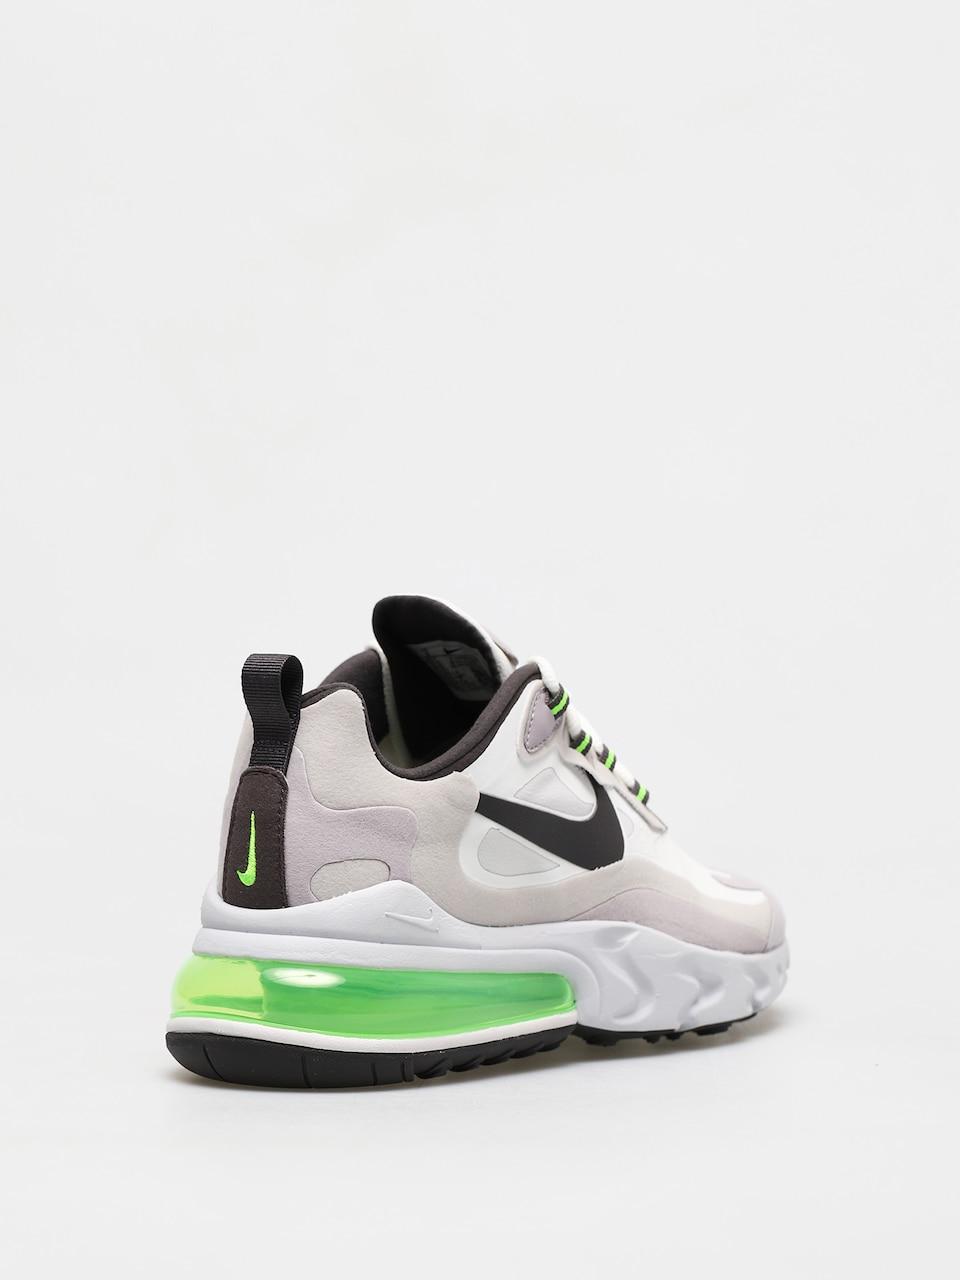 Nike Air Max 270 React Shoes (summit